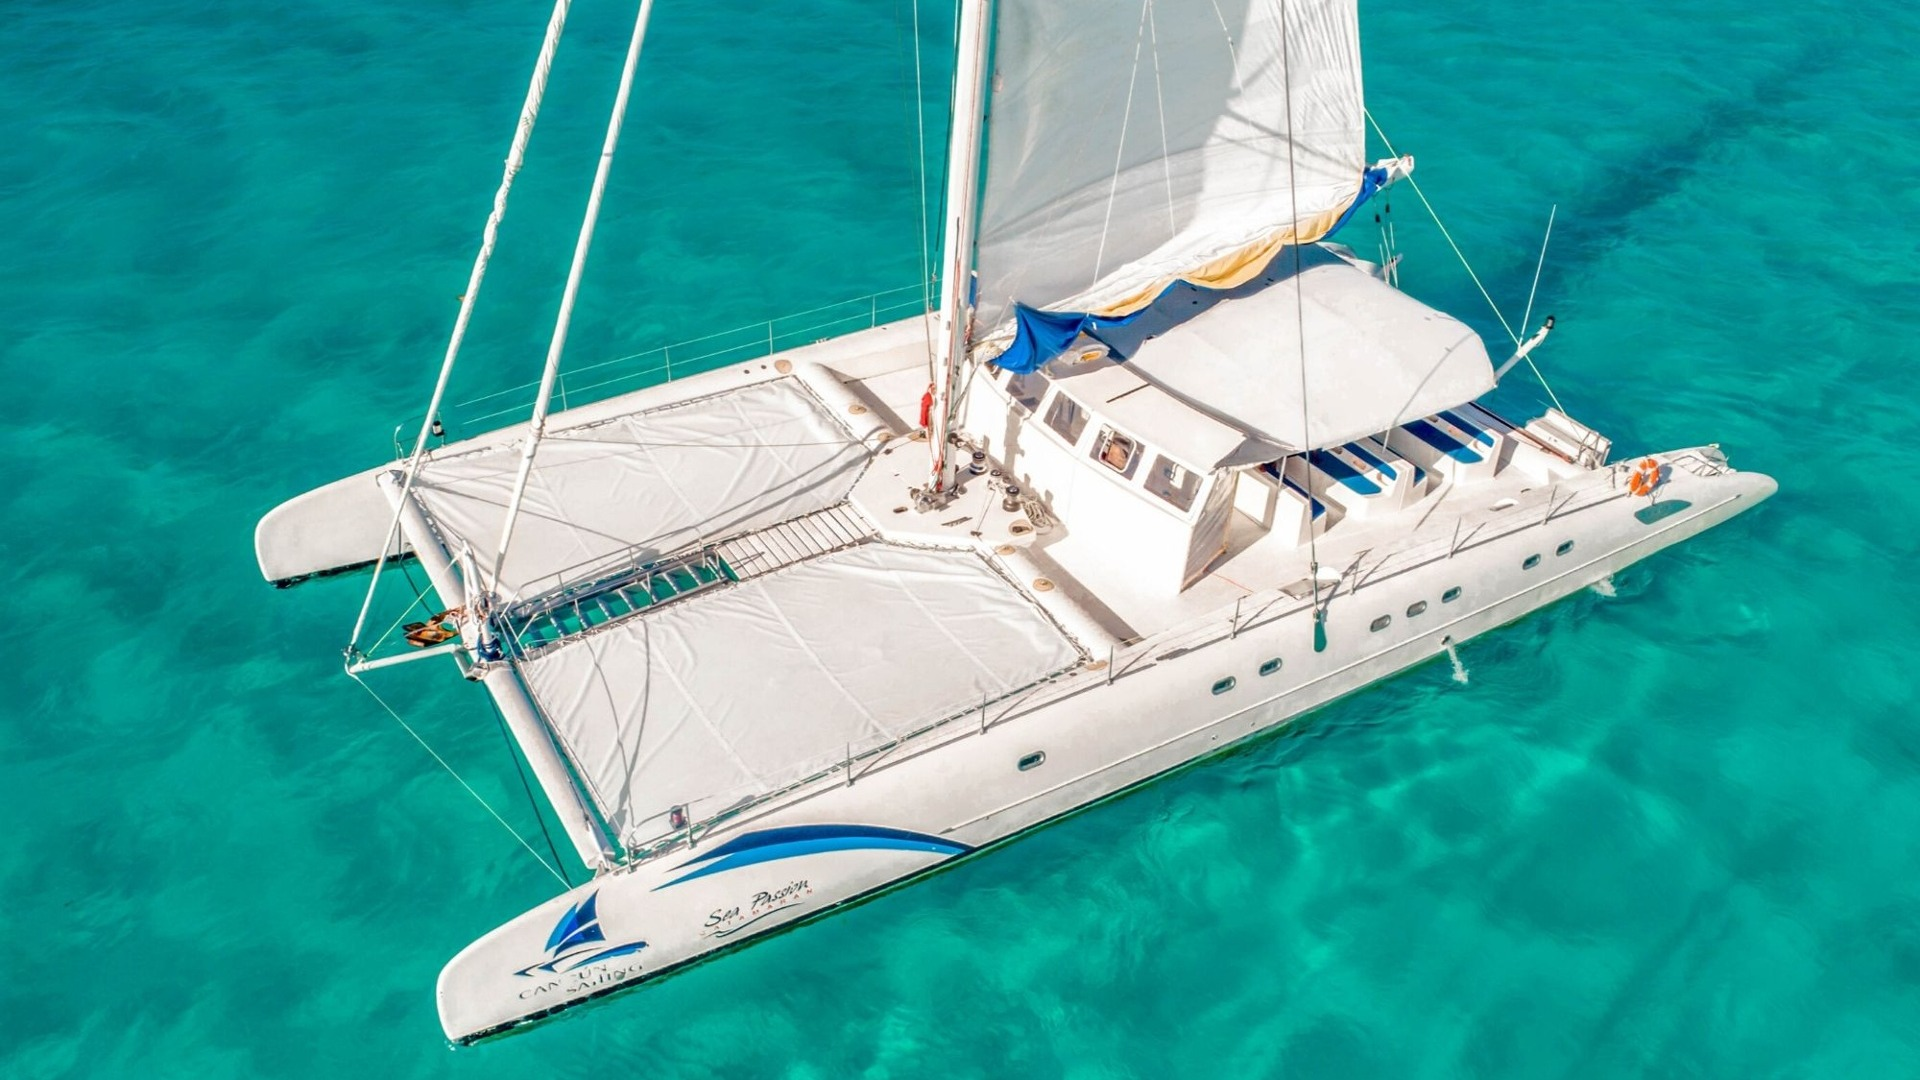 6 - LowRes - Sea Passion III - Isla Mujeres Catamaran Tour - Cancun Sailing